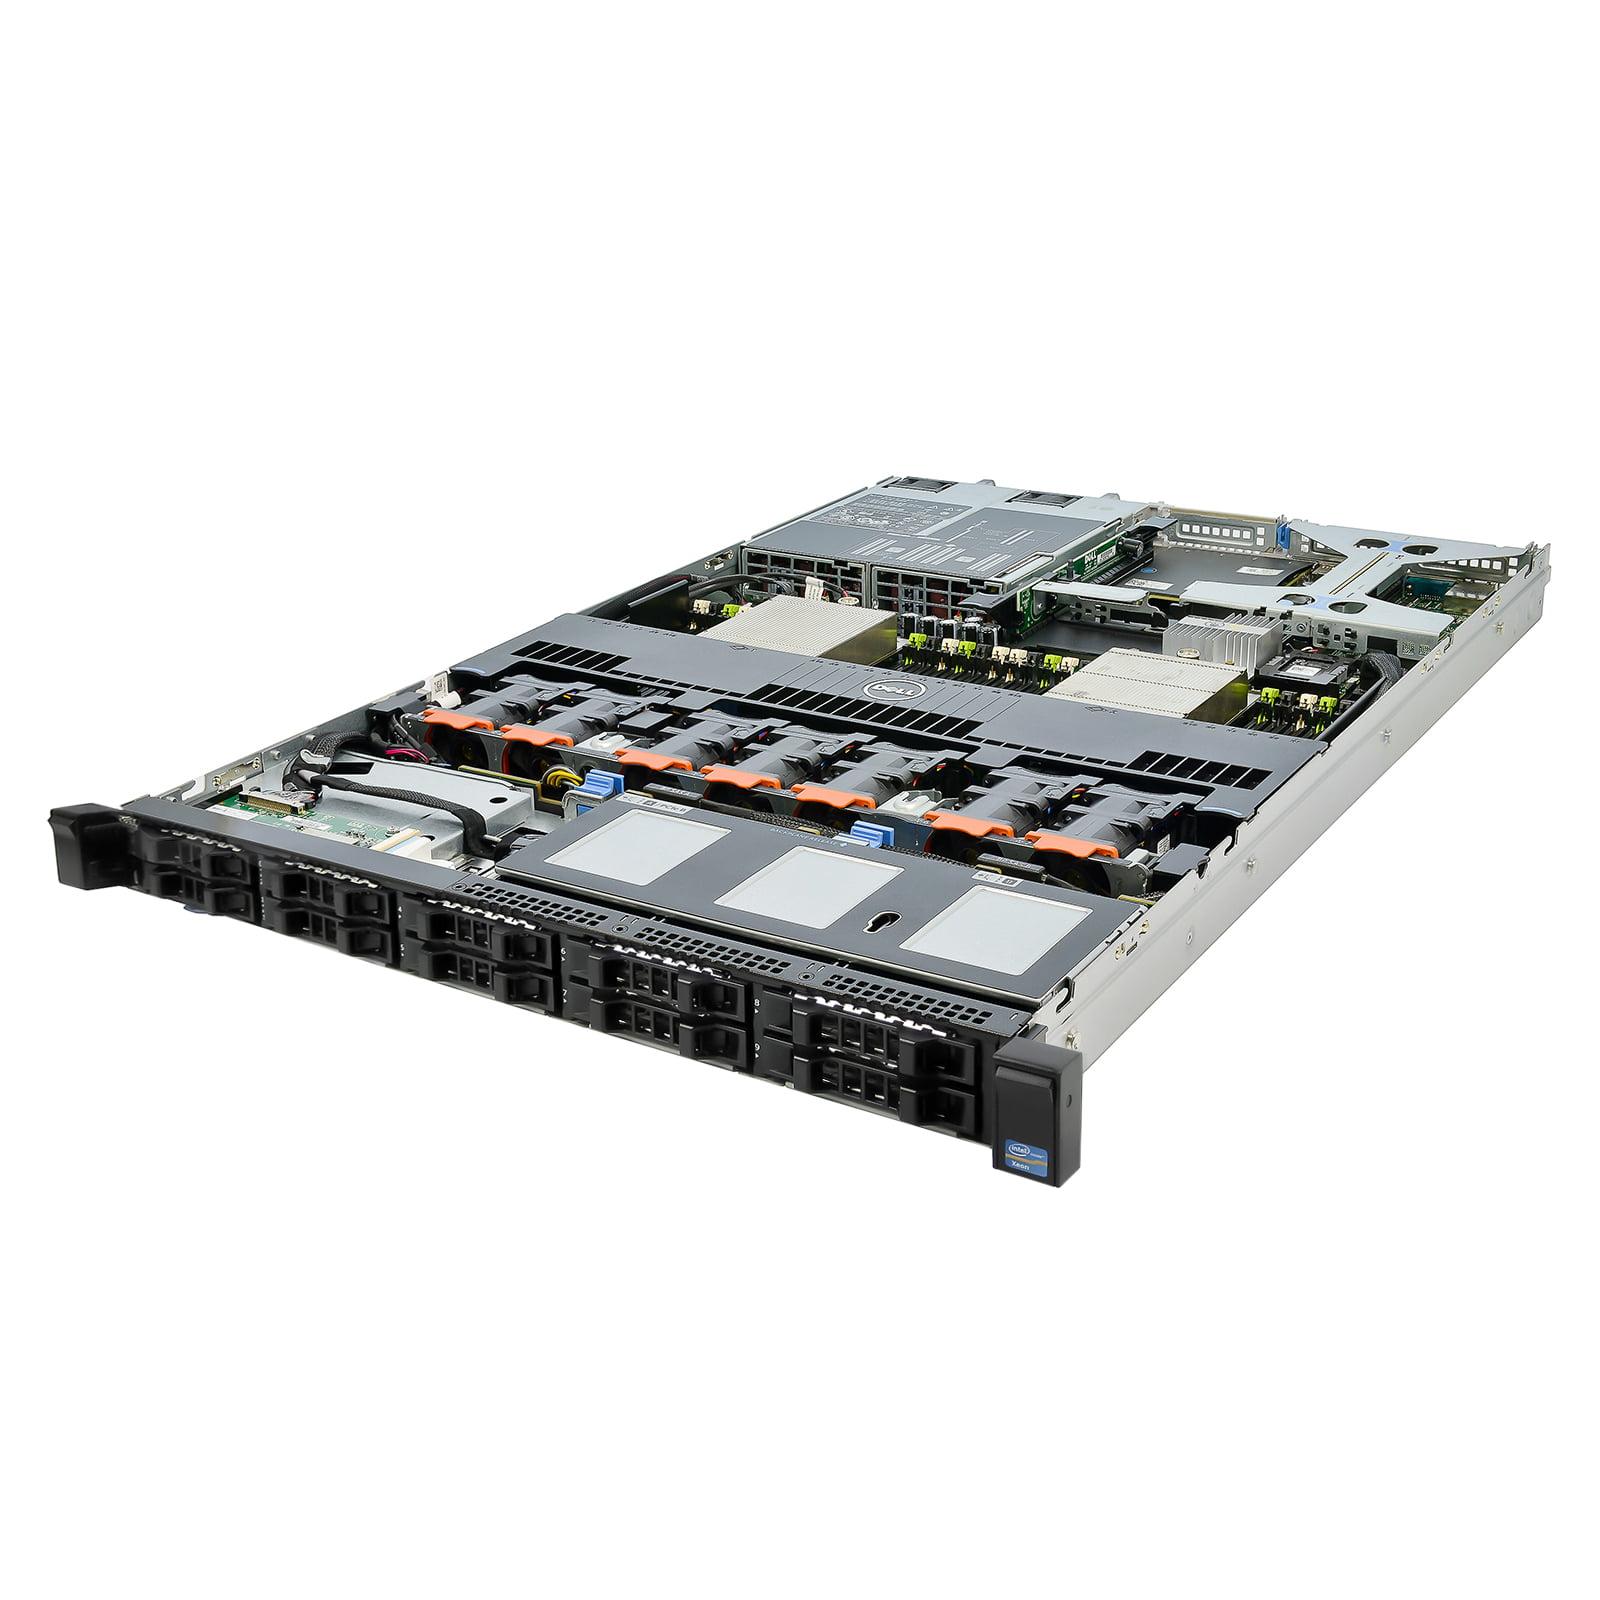 HIGH-END Dell PE R620 Server 2X 2.60GHZ E5-2650V2 8C 96GB...